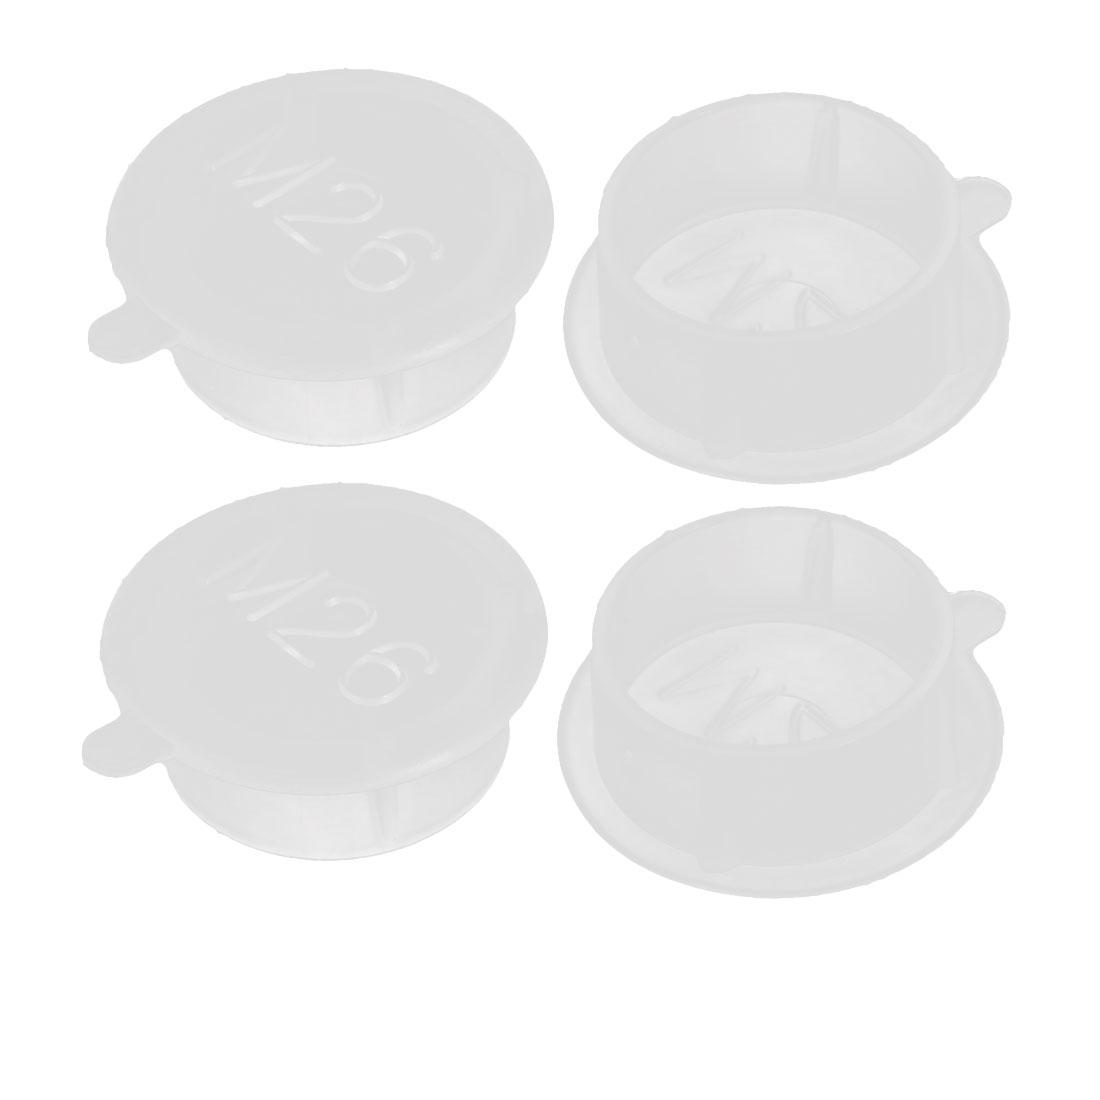 4pcs M26 PE Flat Blanking End Tube Insert Cap Round Cover Transparent